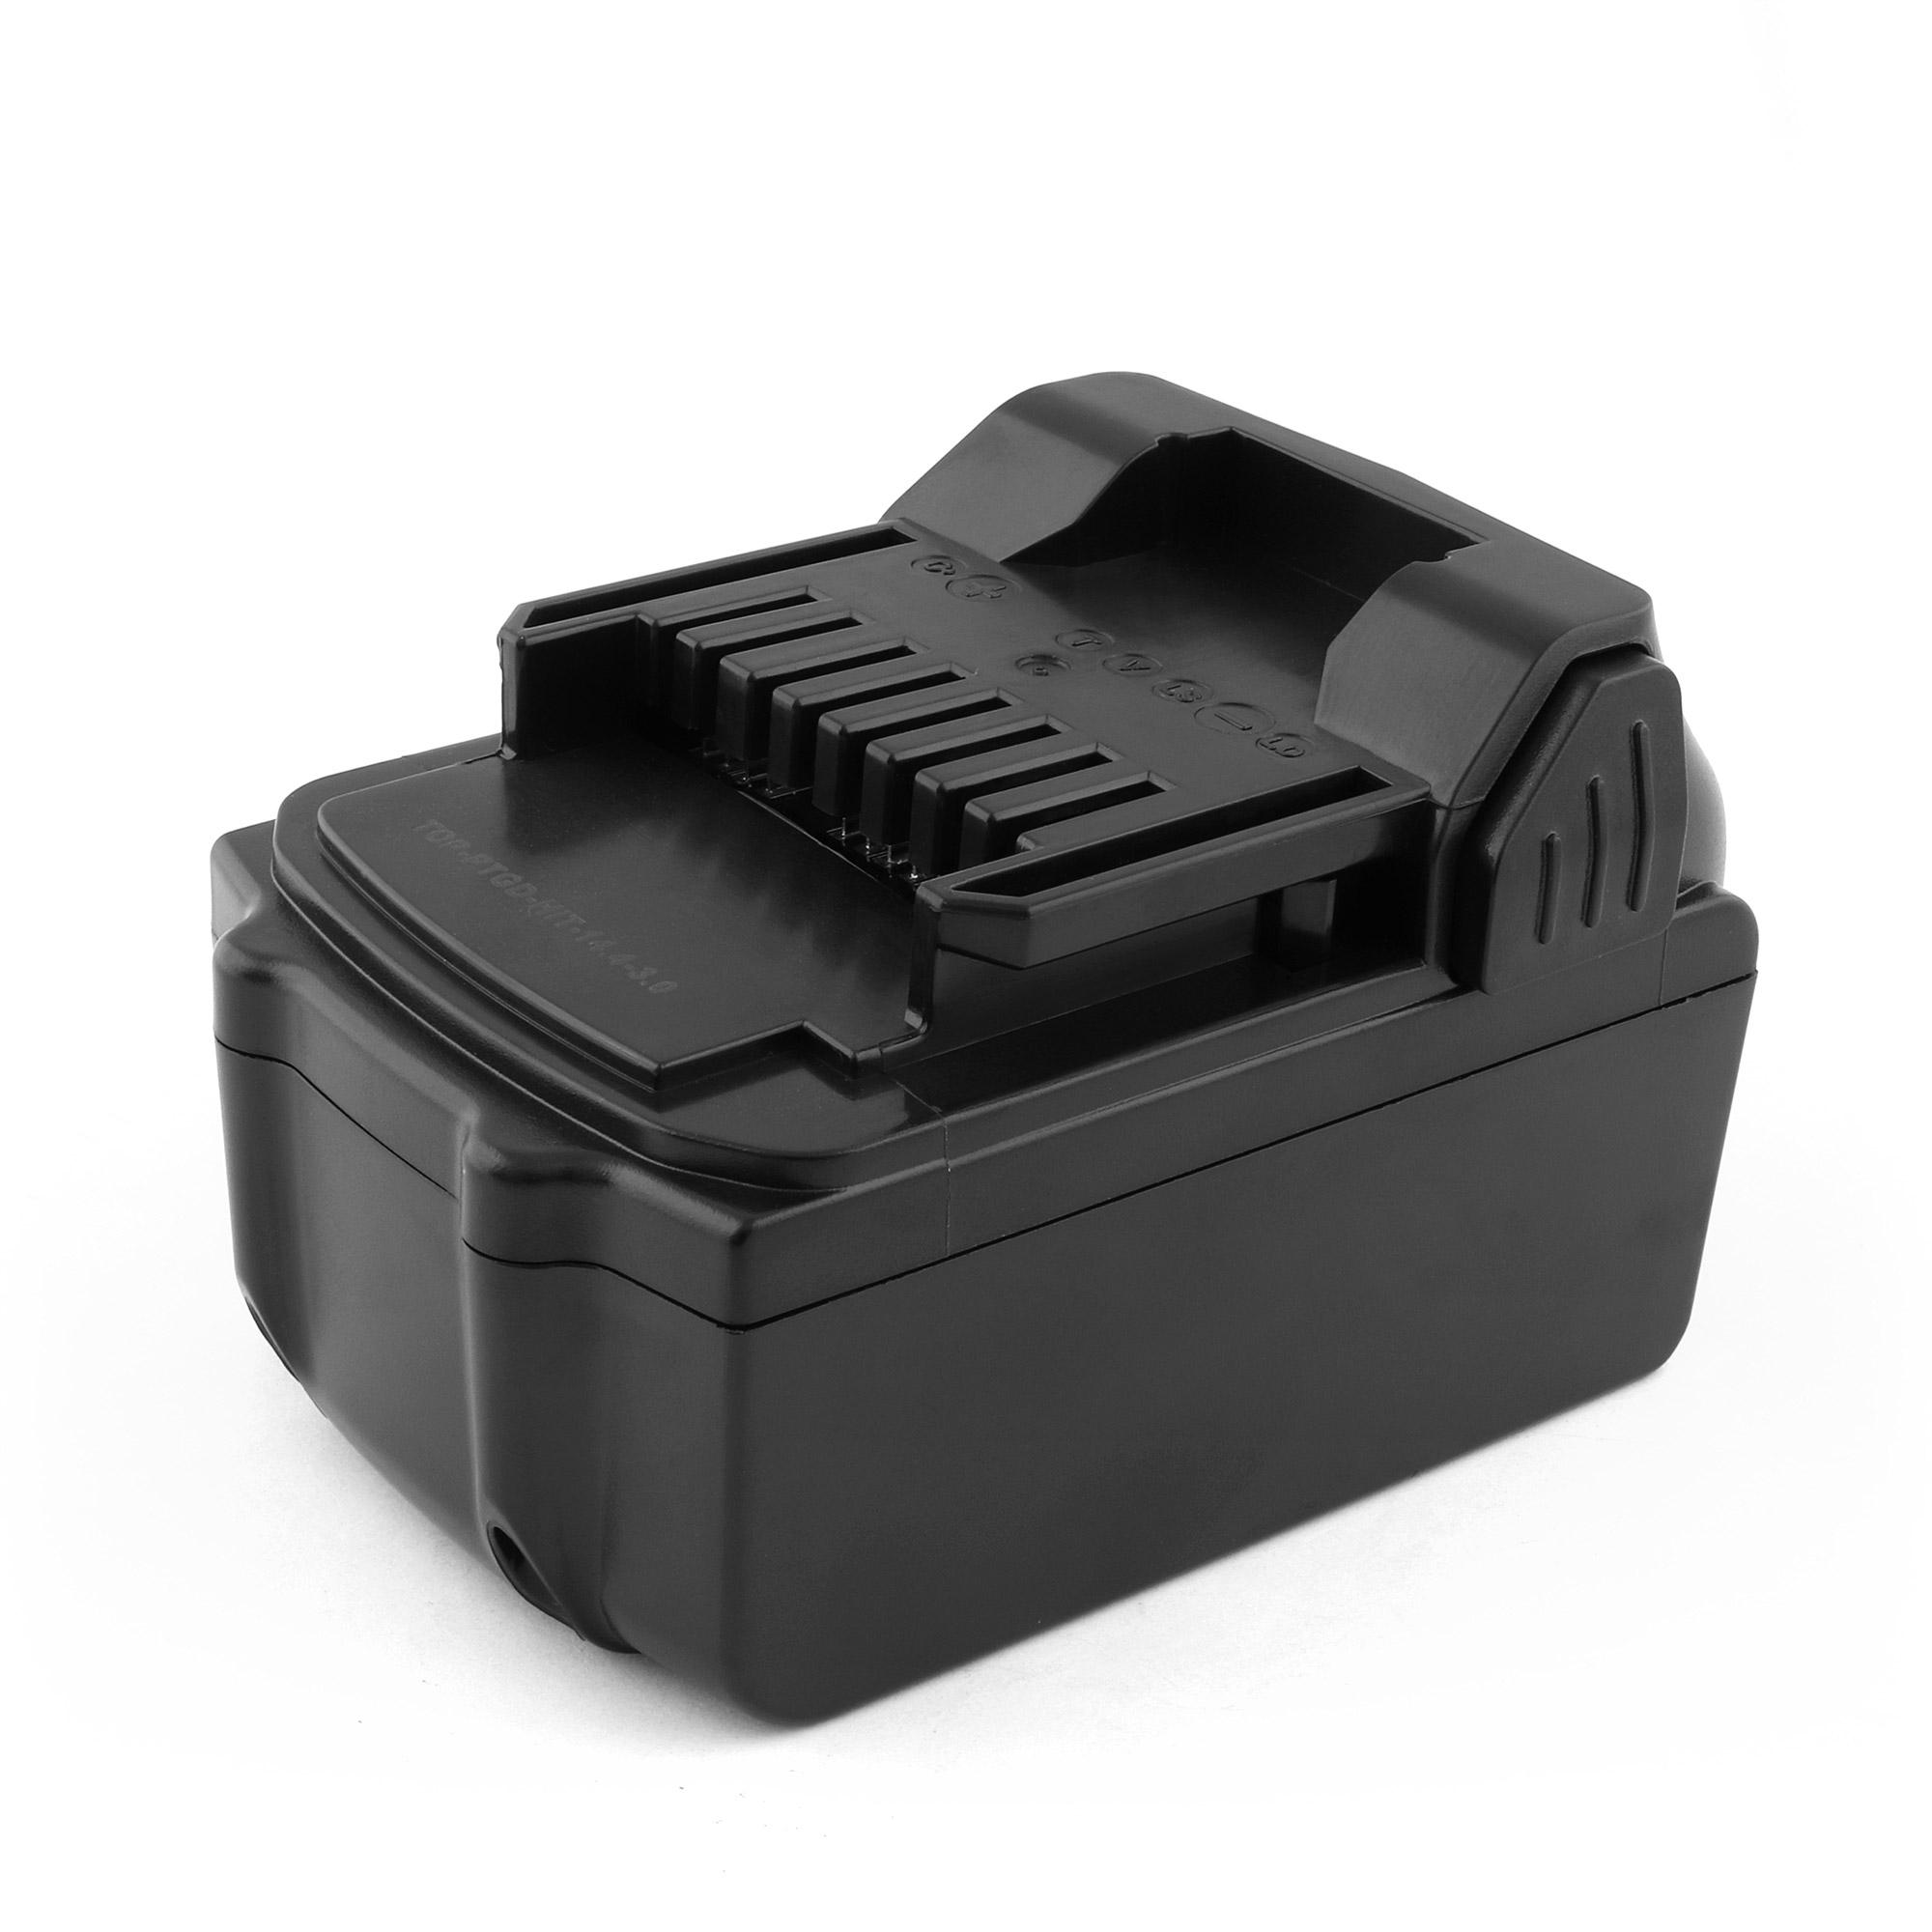 Аккумулятор для электроинструмента Hitachi CJ, DH, DS, DV, G, RB, WH, WR Series. 14.4V 300